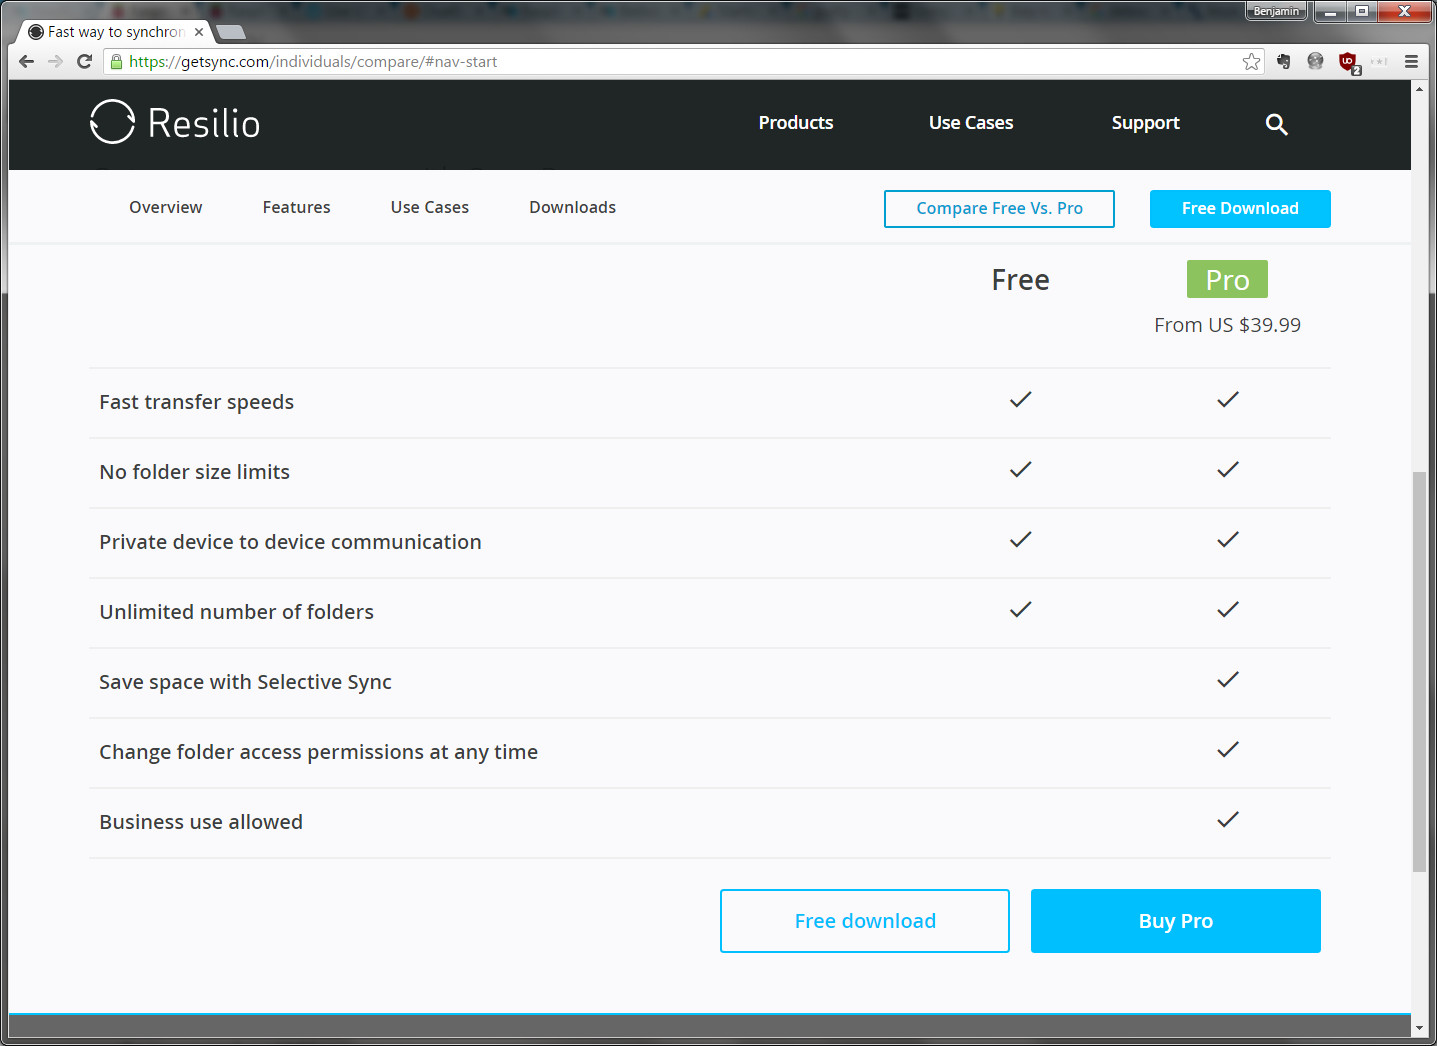 BitTorrent Sync free vs pro